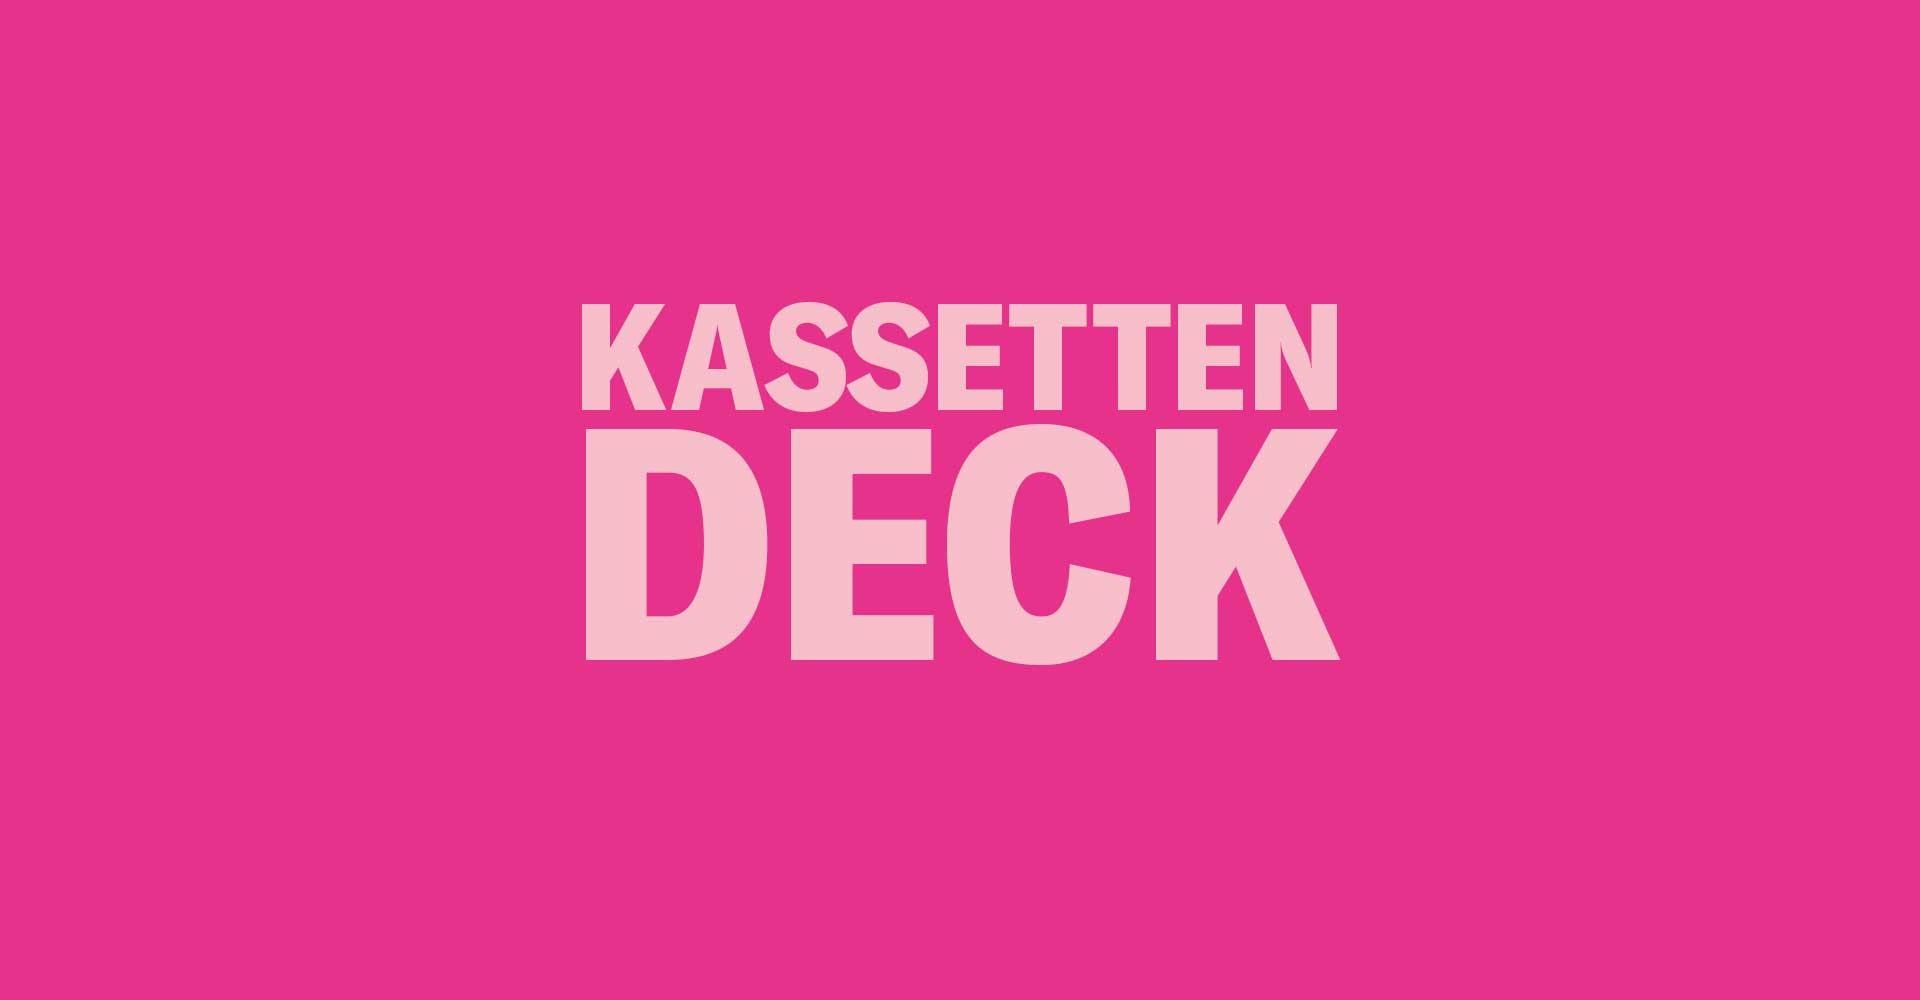 Musikmaschine-Konzerte-Livemusik-Bands-Mainz-Rhein-Main-Kassettendeck-Altmuensterkirche-Good-Morning-Yesterday